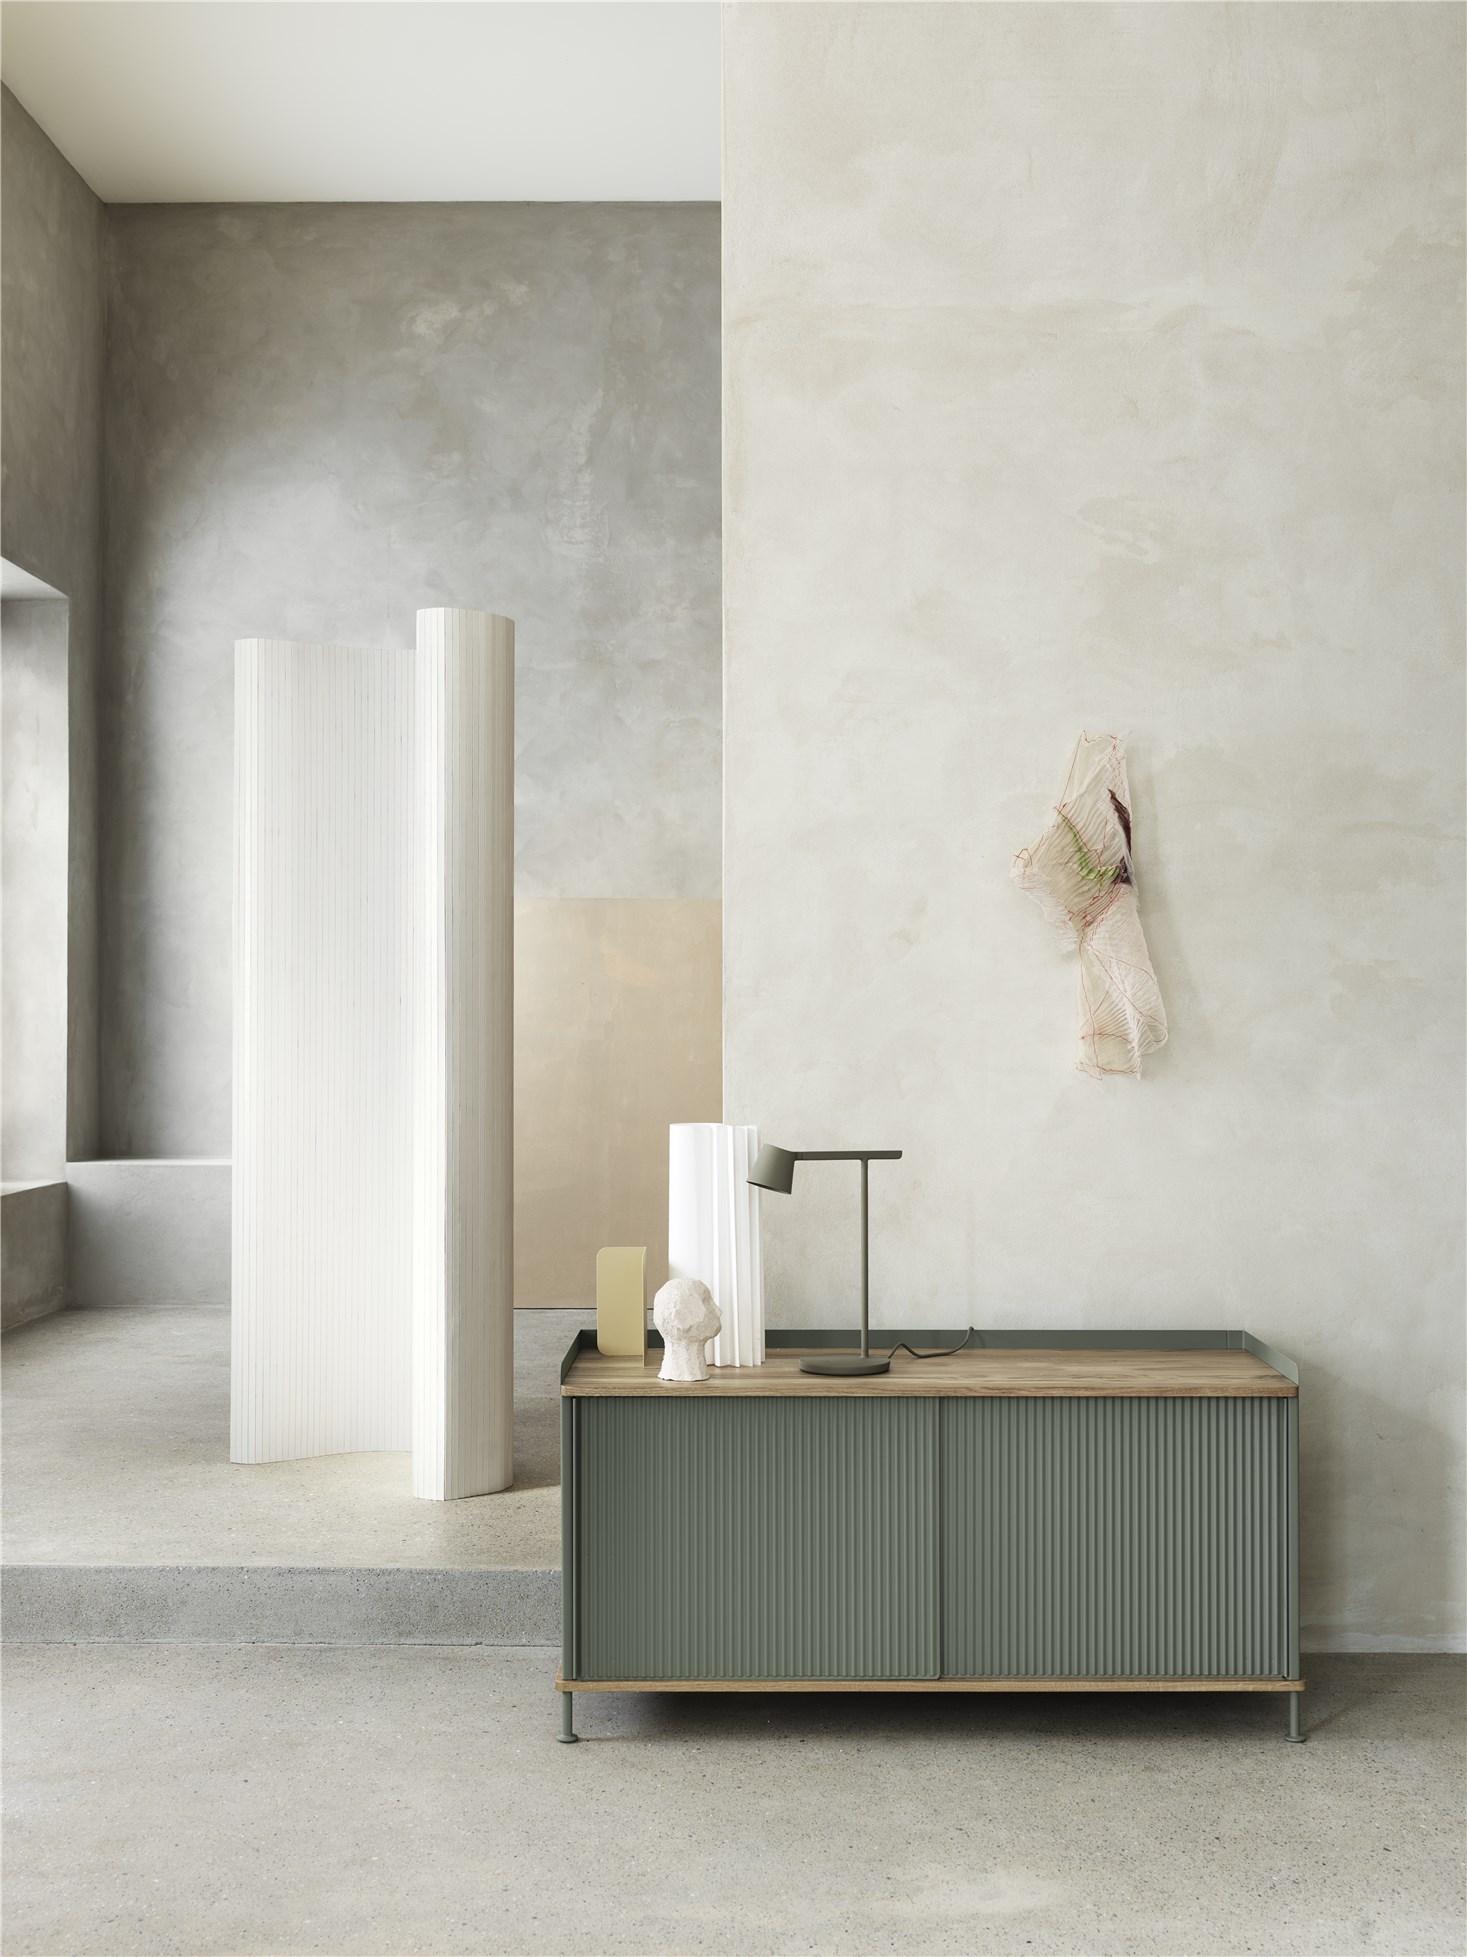 Enfold-Sideboard-low-oak-dusty-green-Tip-Lamp-Olive-Compile-Bookend-Green-Beige-Org.jpg